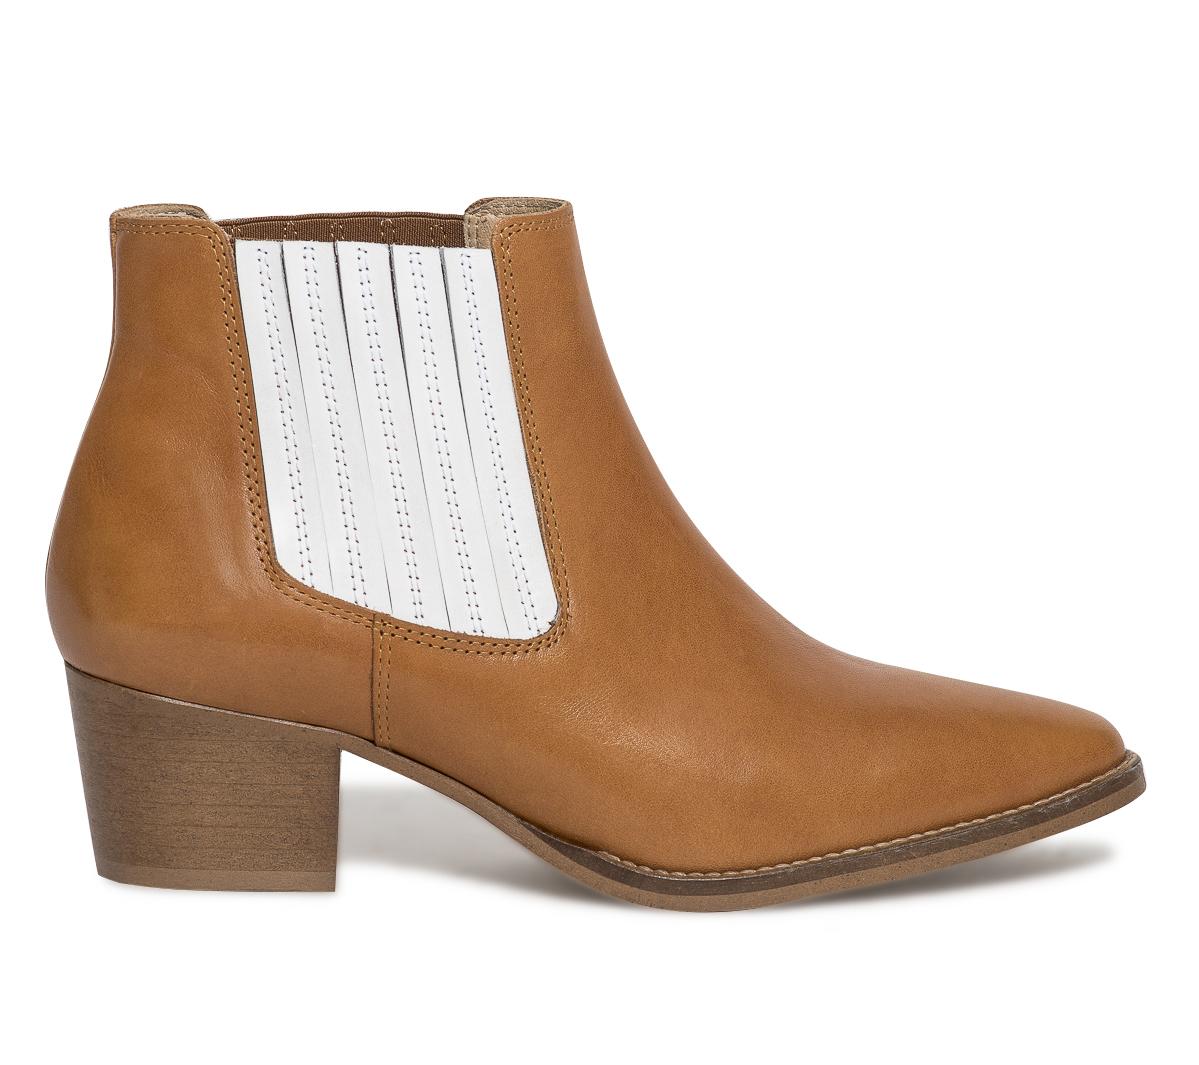 Eram À Cuir Cognac Blancs Boots Piqués Élastiques TFKJl1c